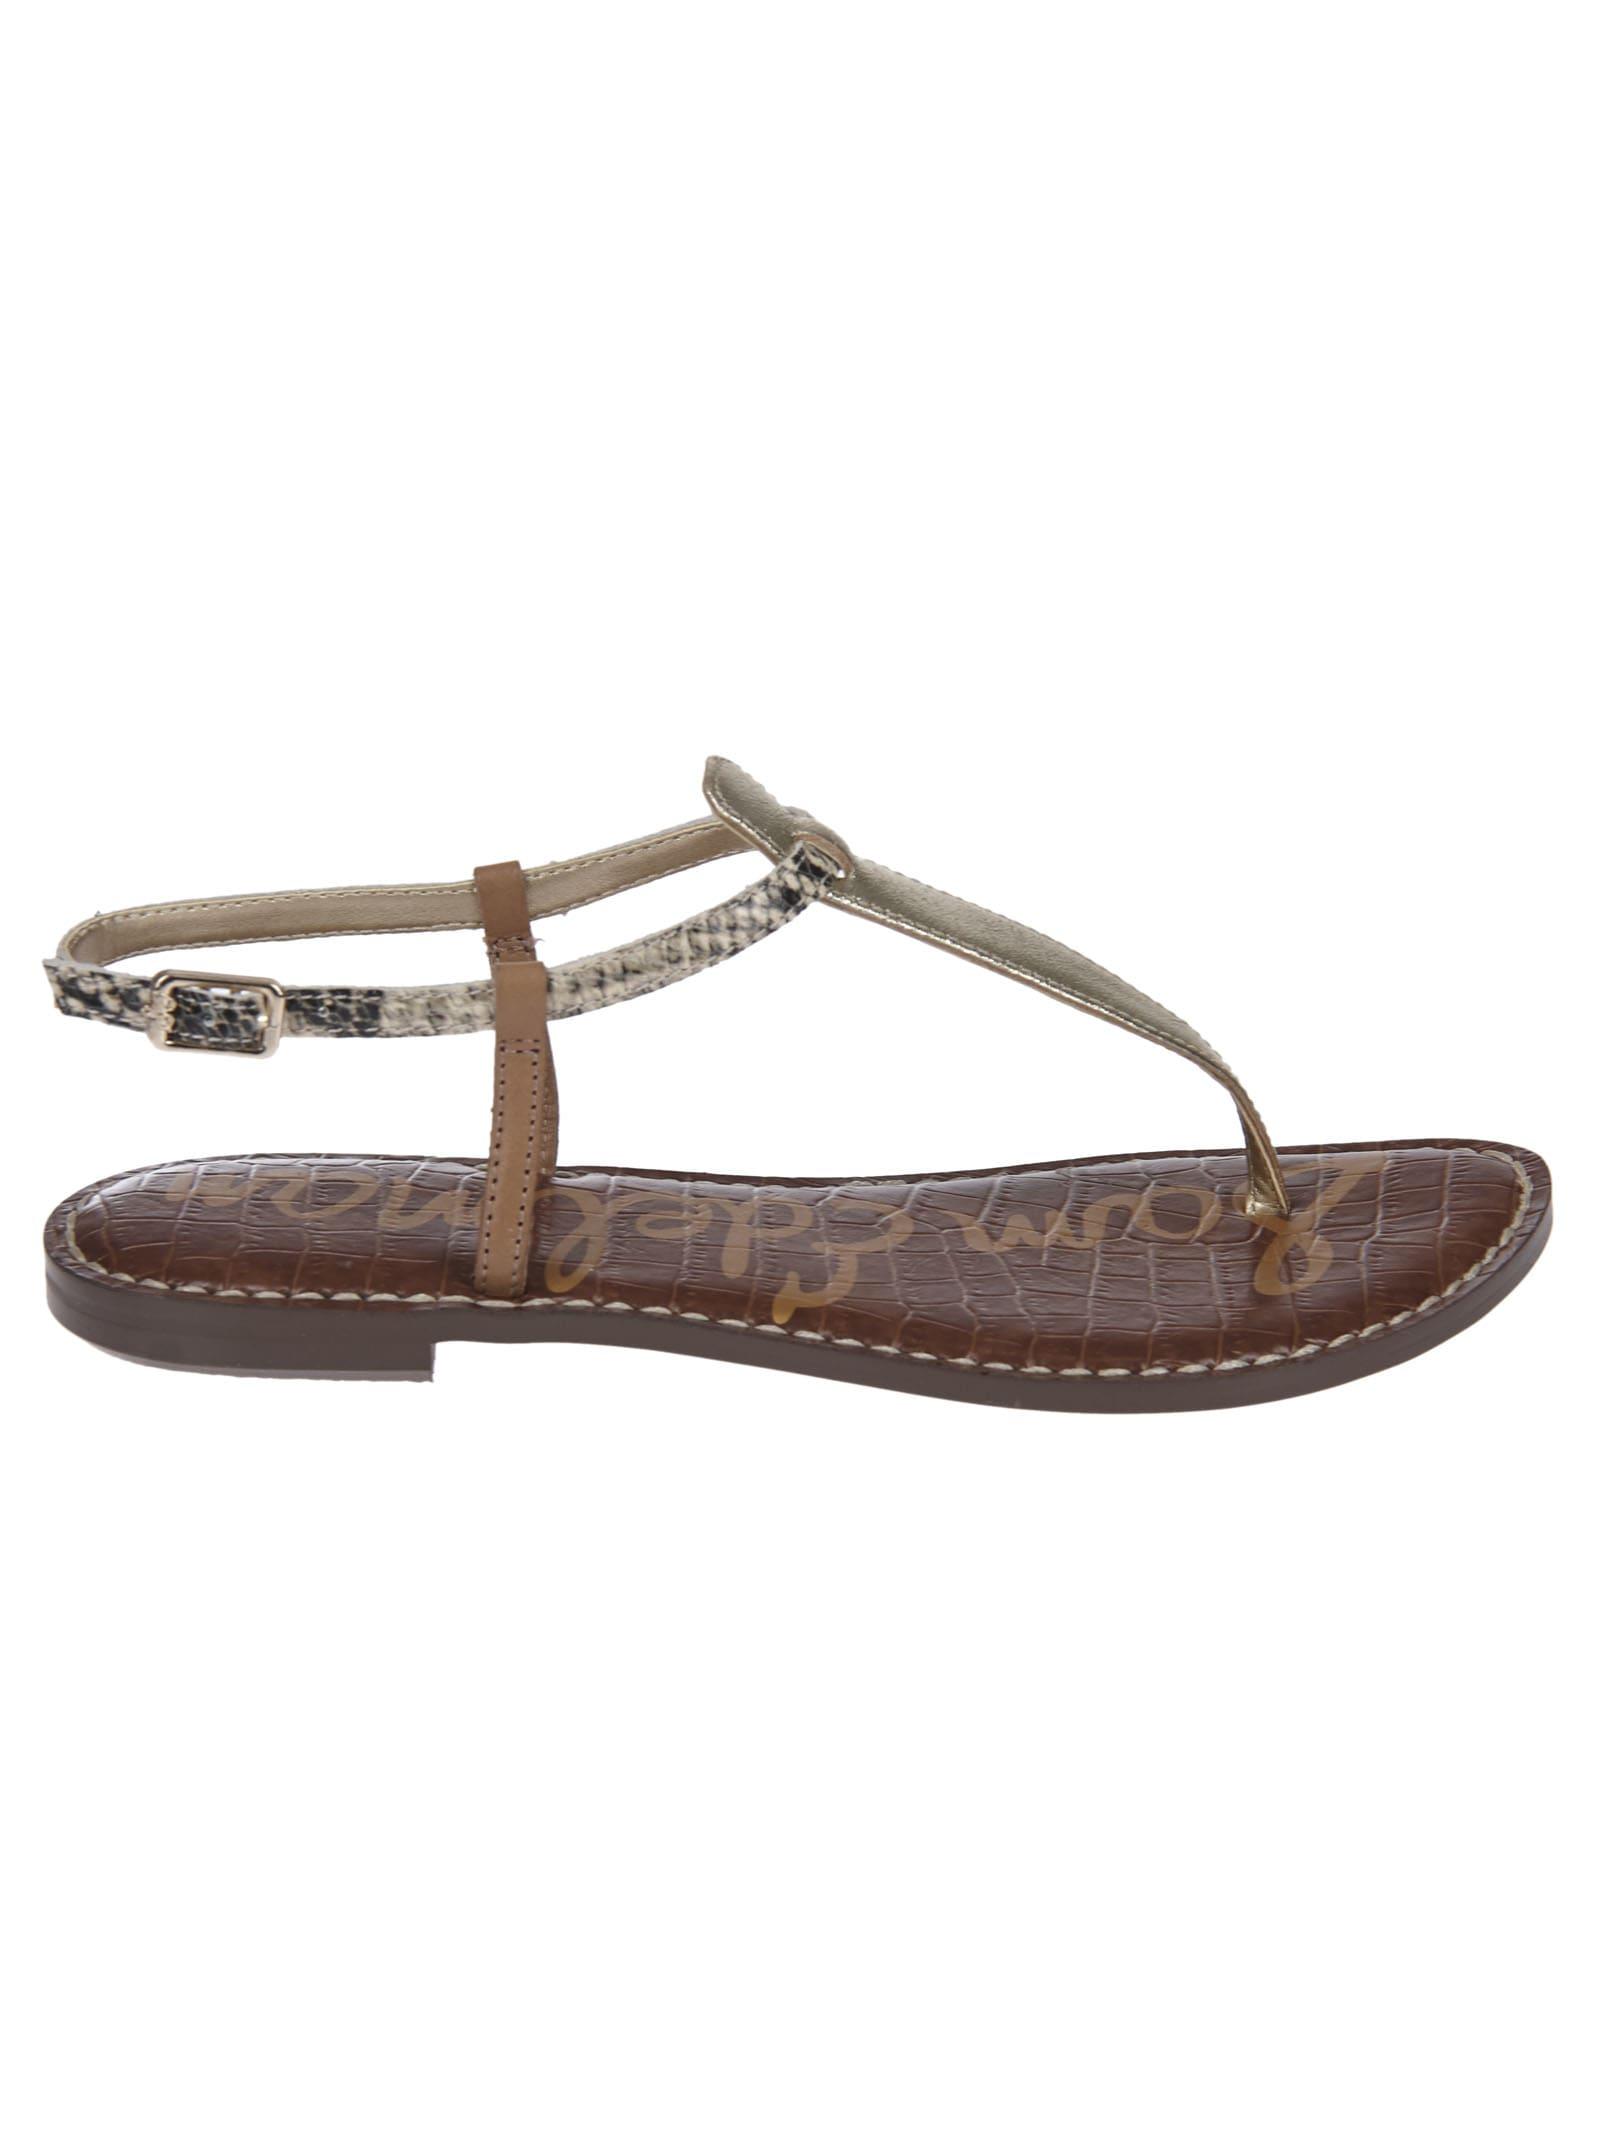 Sam Edelman Logo Flat Sandals.